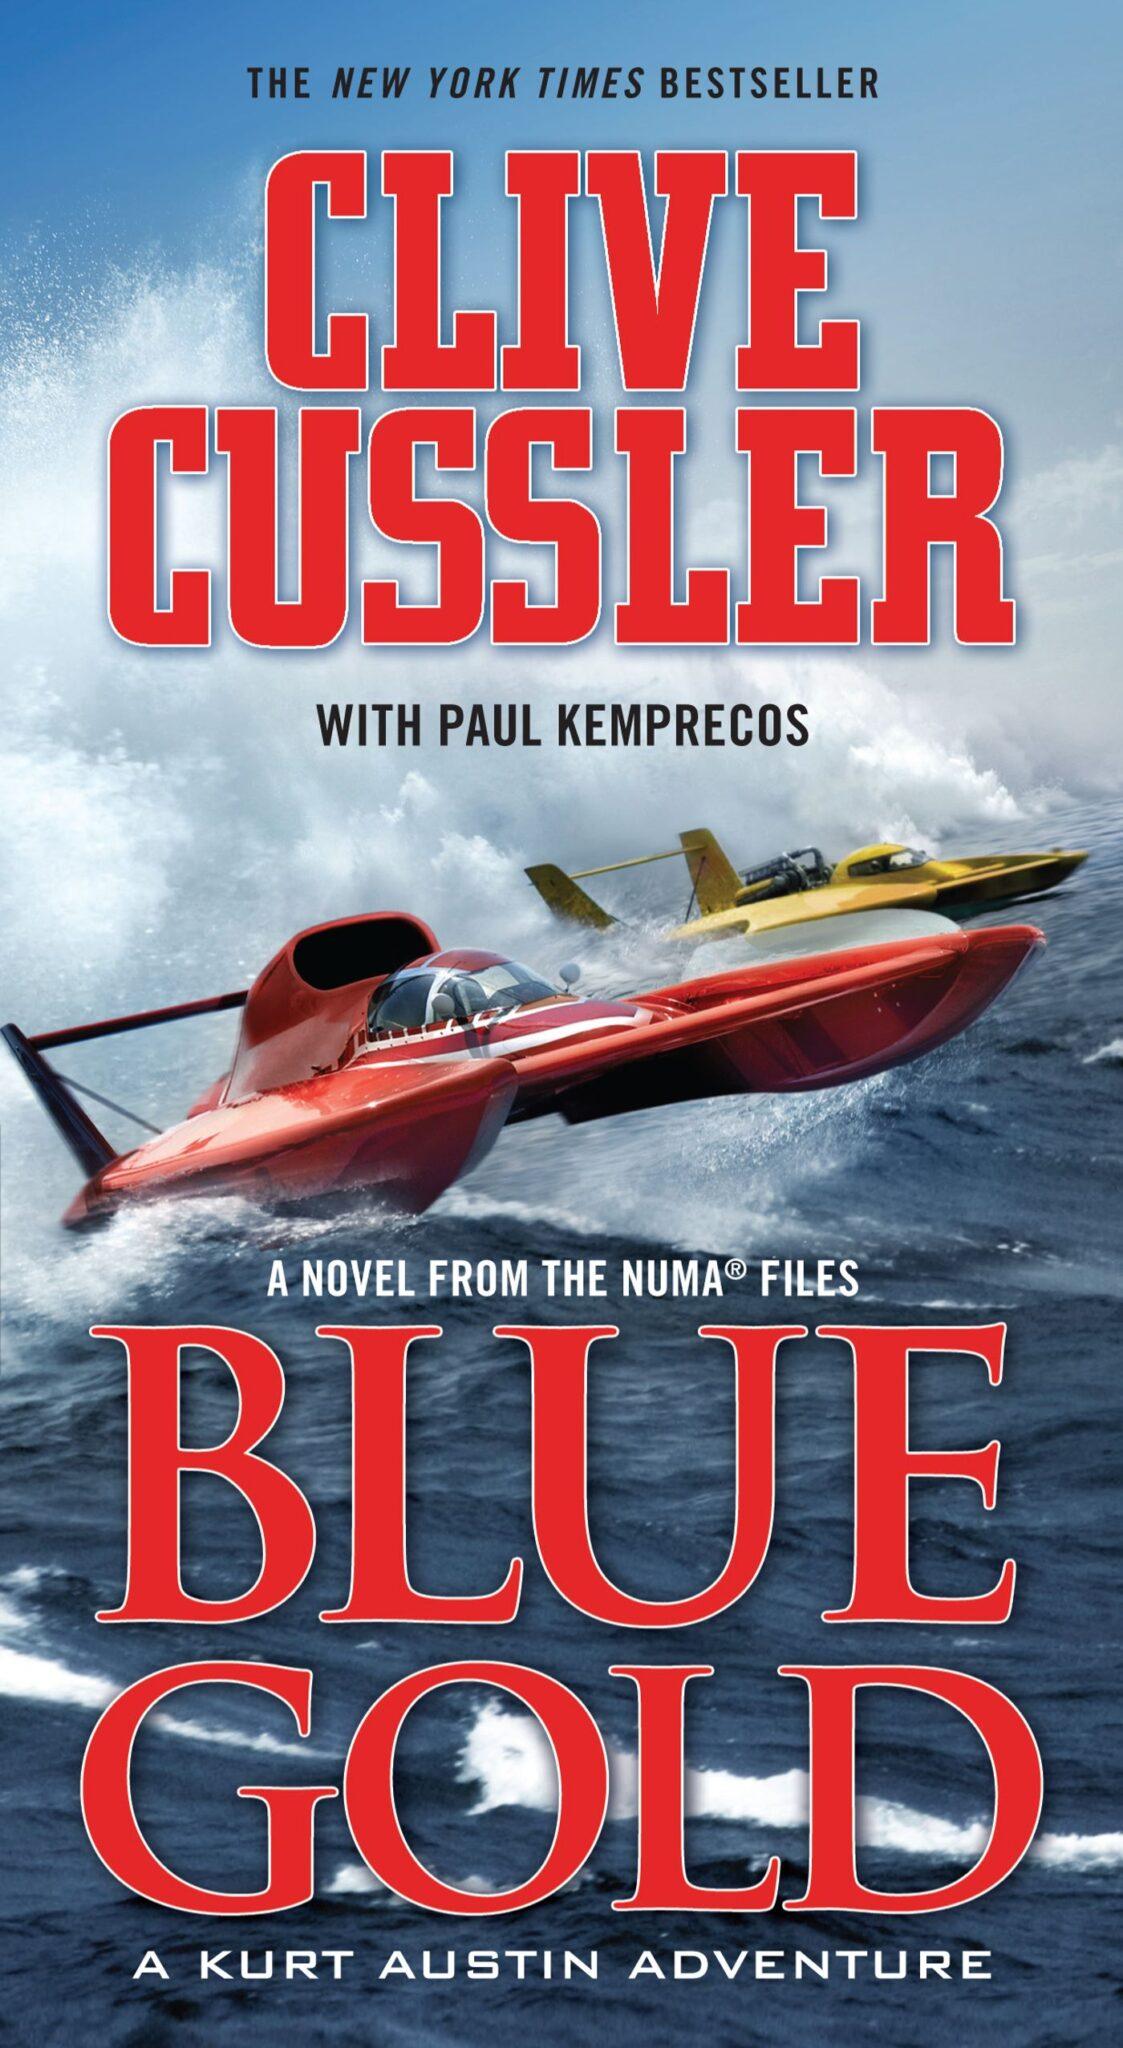 Clive Cussler books 19